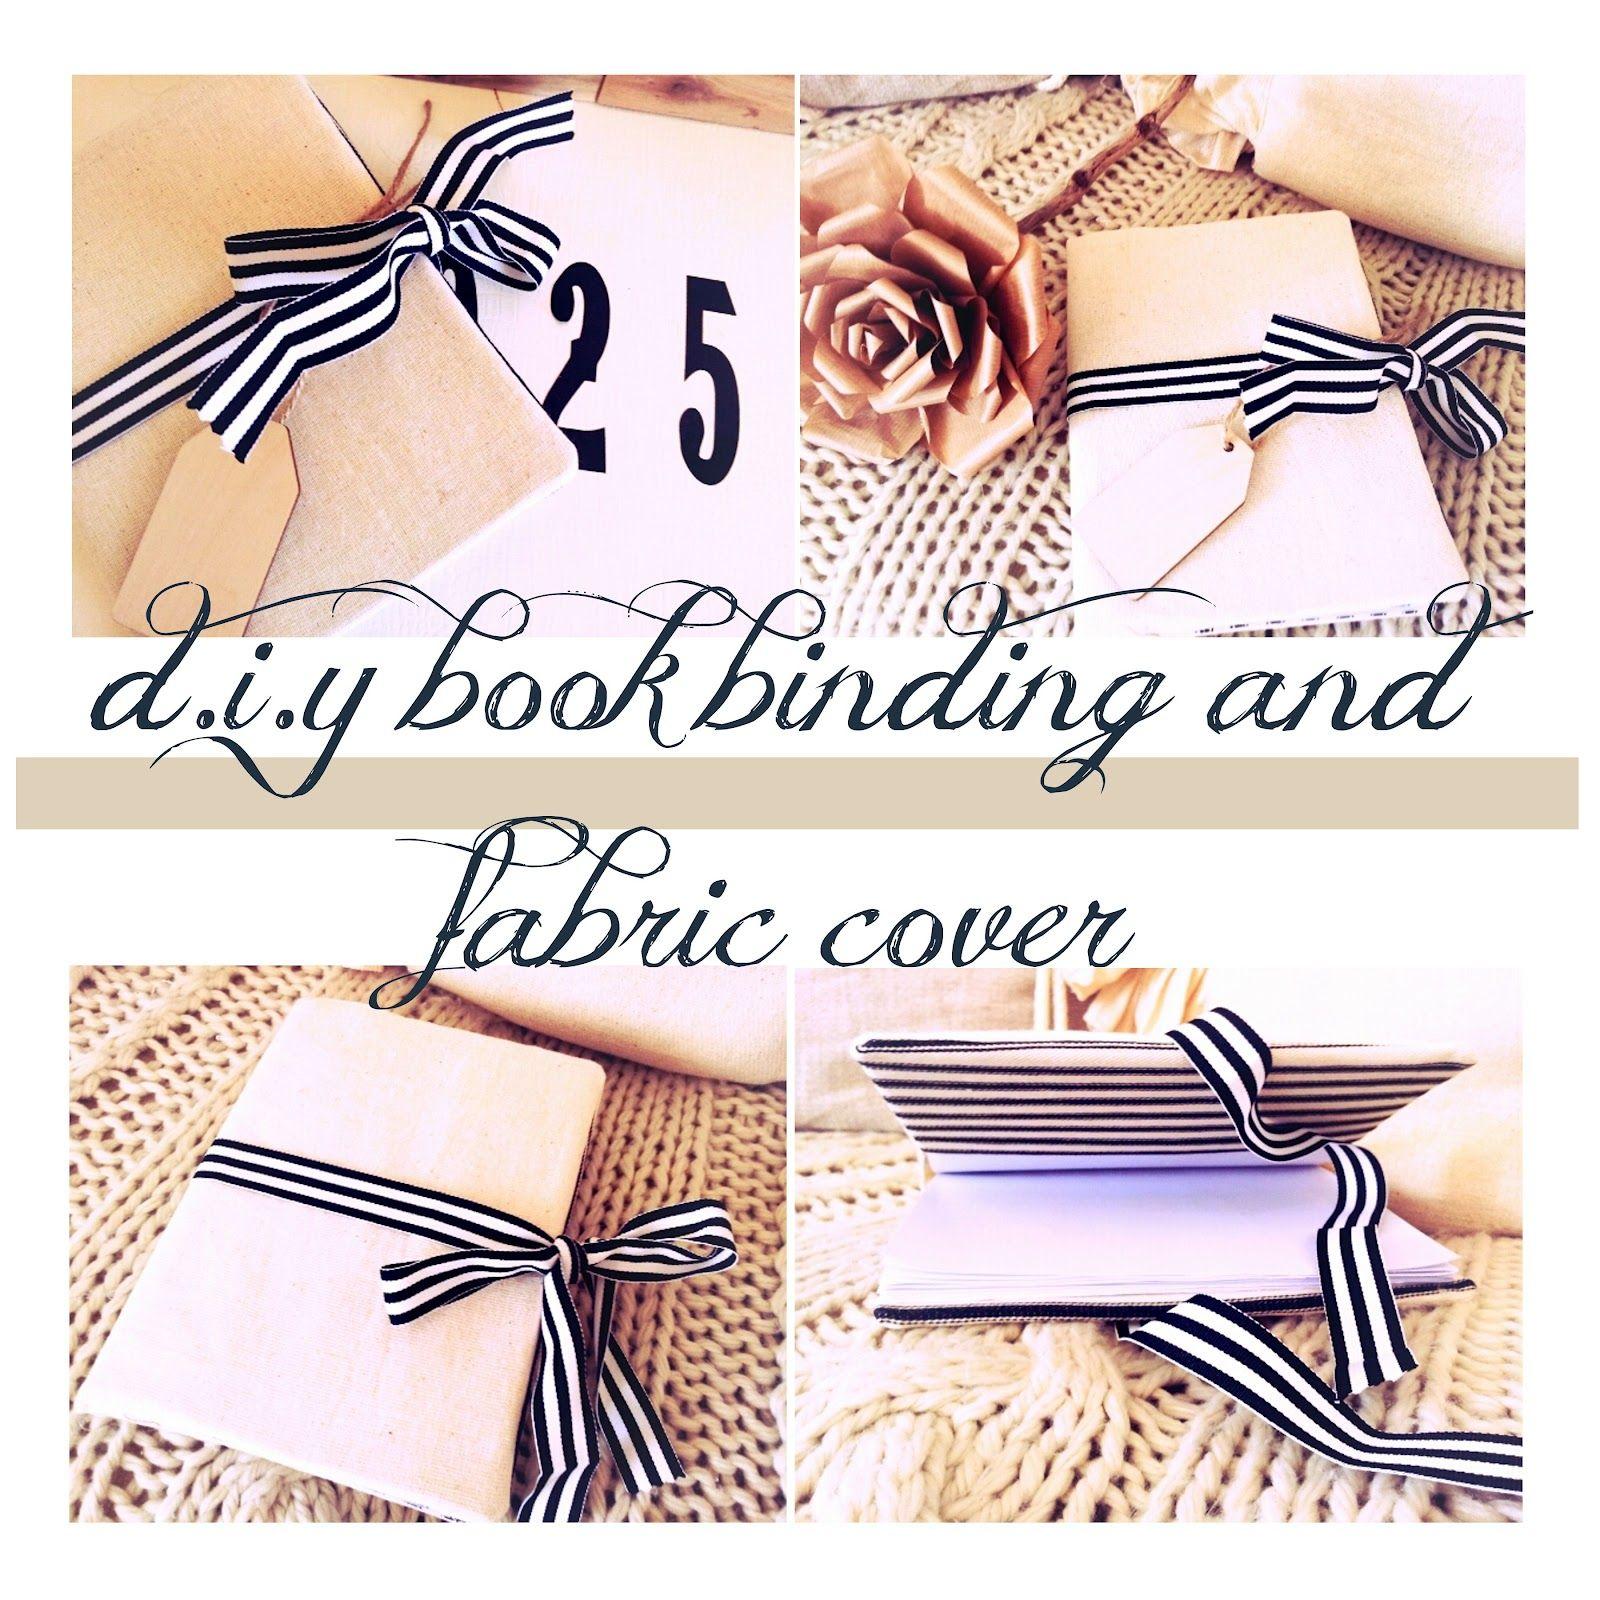 book binding and fabric cover tutorial Book binding diy